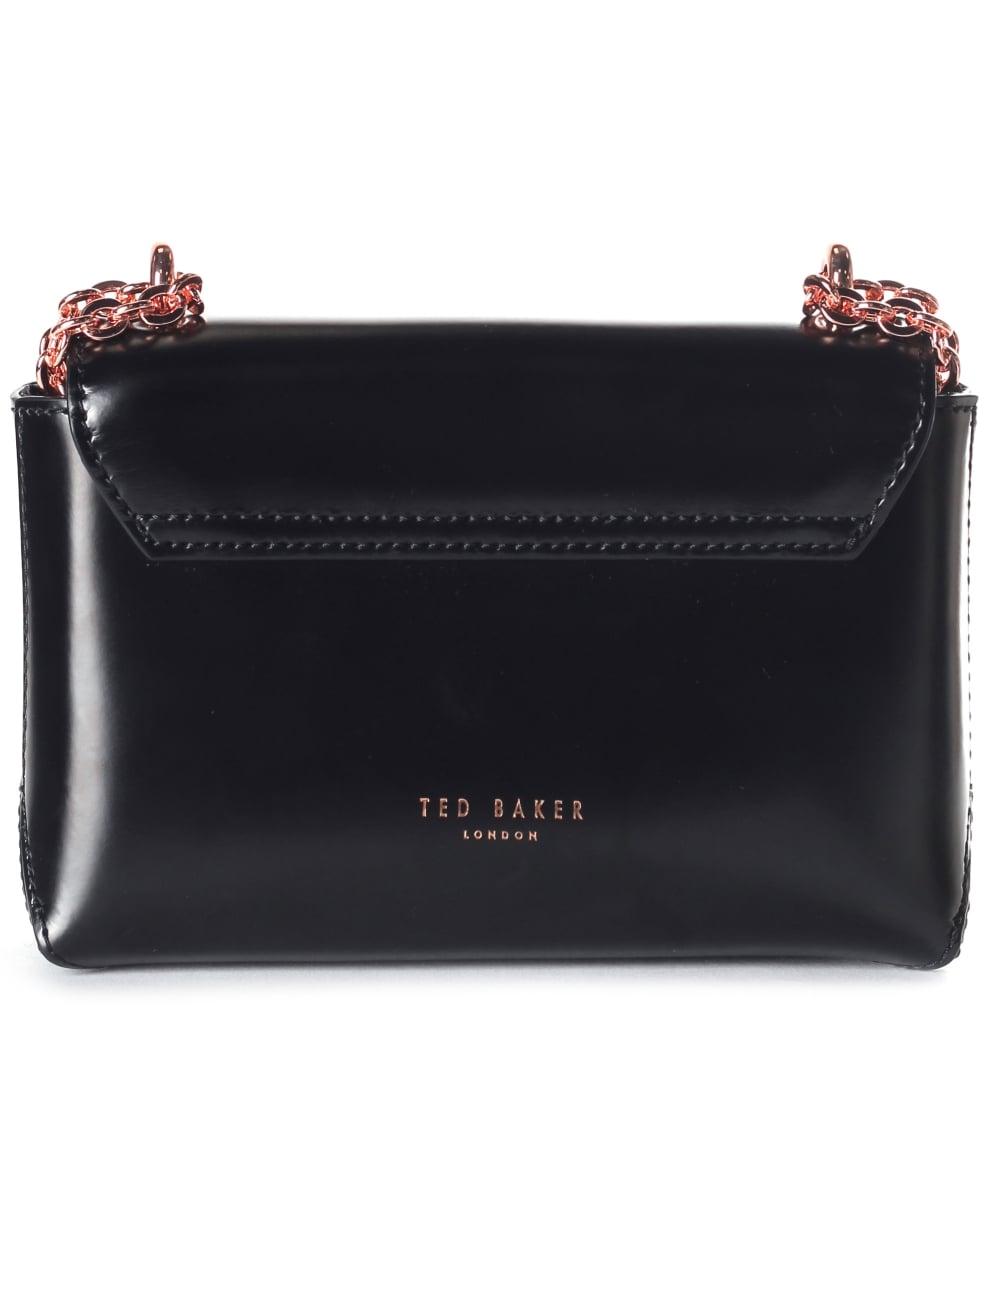 81d8f9dc7458 Ted Baker Adoni Crystal Lock Women s Mini Crossbody Bag Black